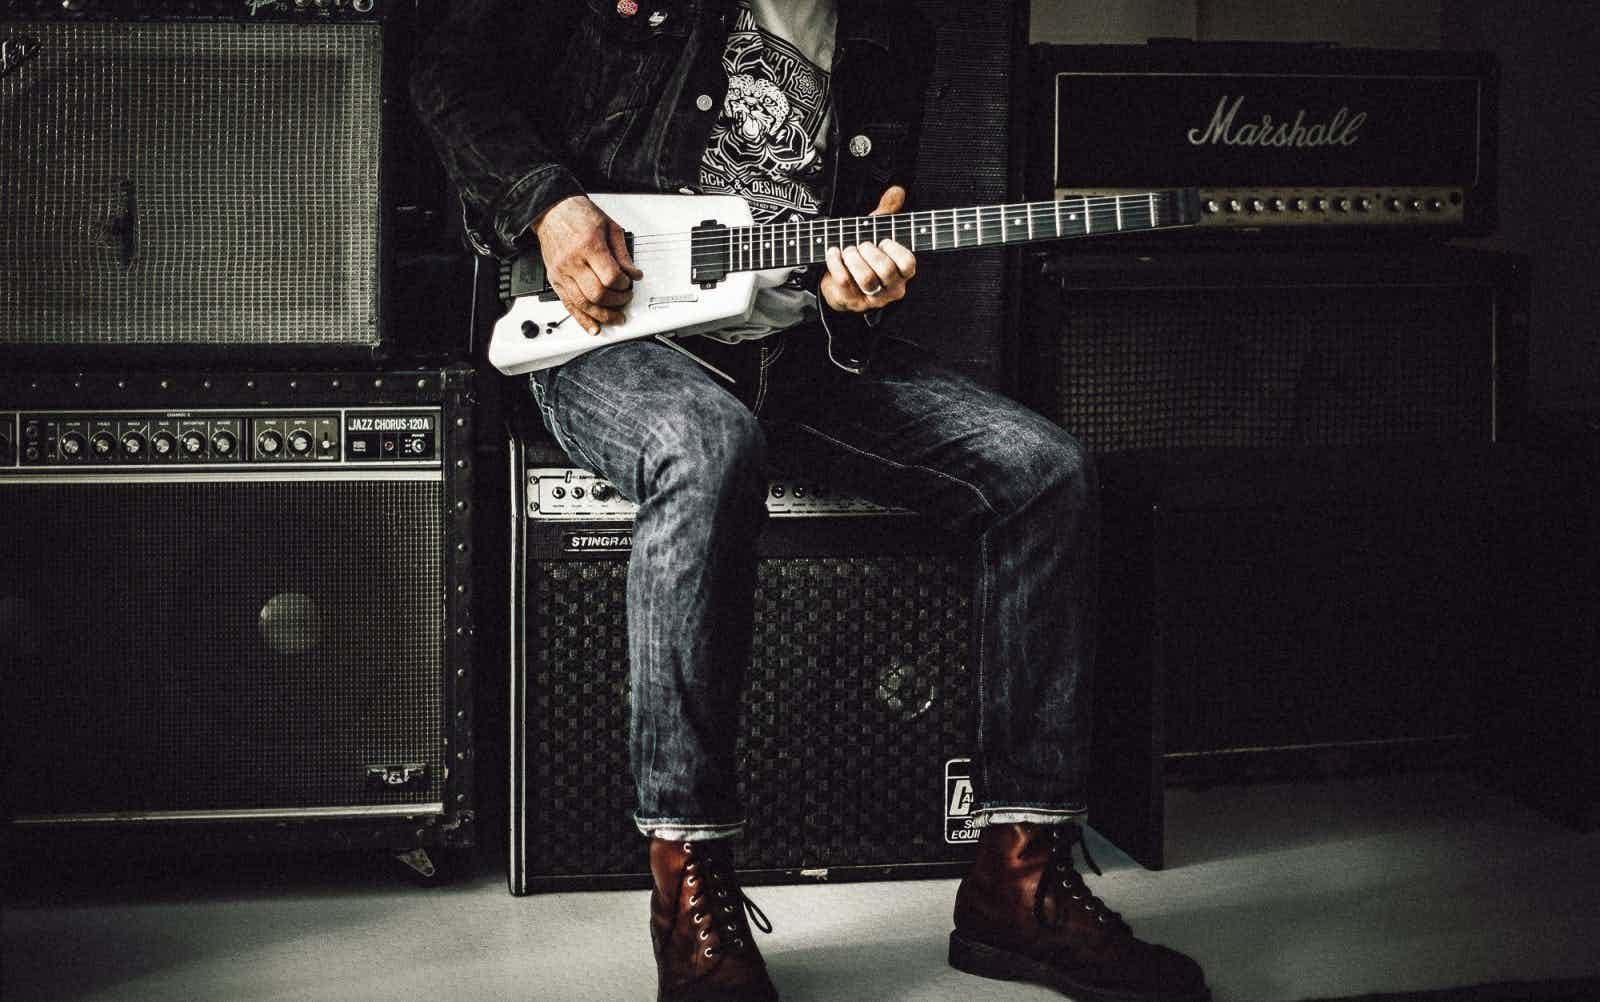 gitarist boeken.jpg